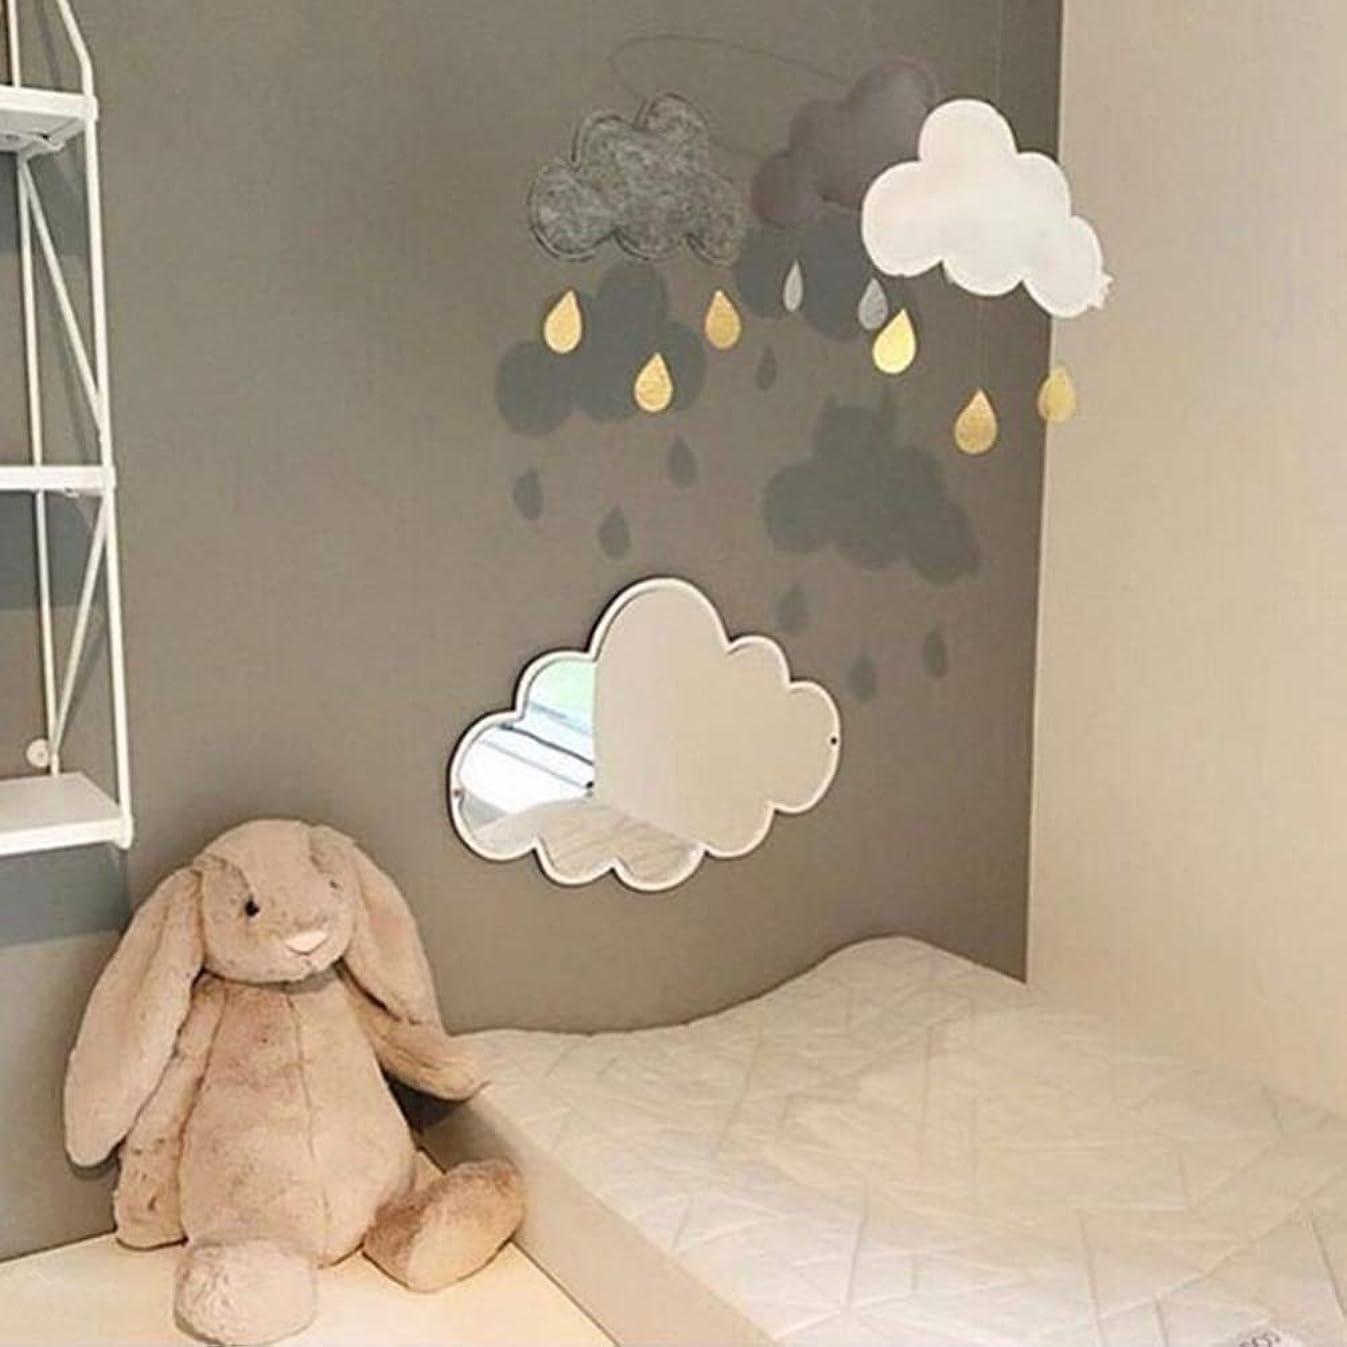 Nodic Kid Bedroom Nursery Decoration Cute Cloud Face Mirror Shatterproof Wood Decor Acrylic Mirror Garden Wall Art Decor Gift